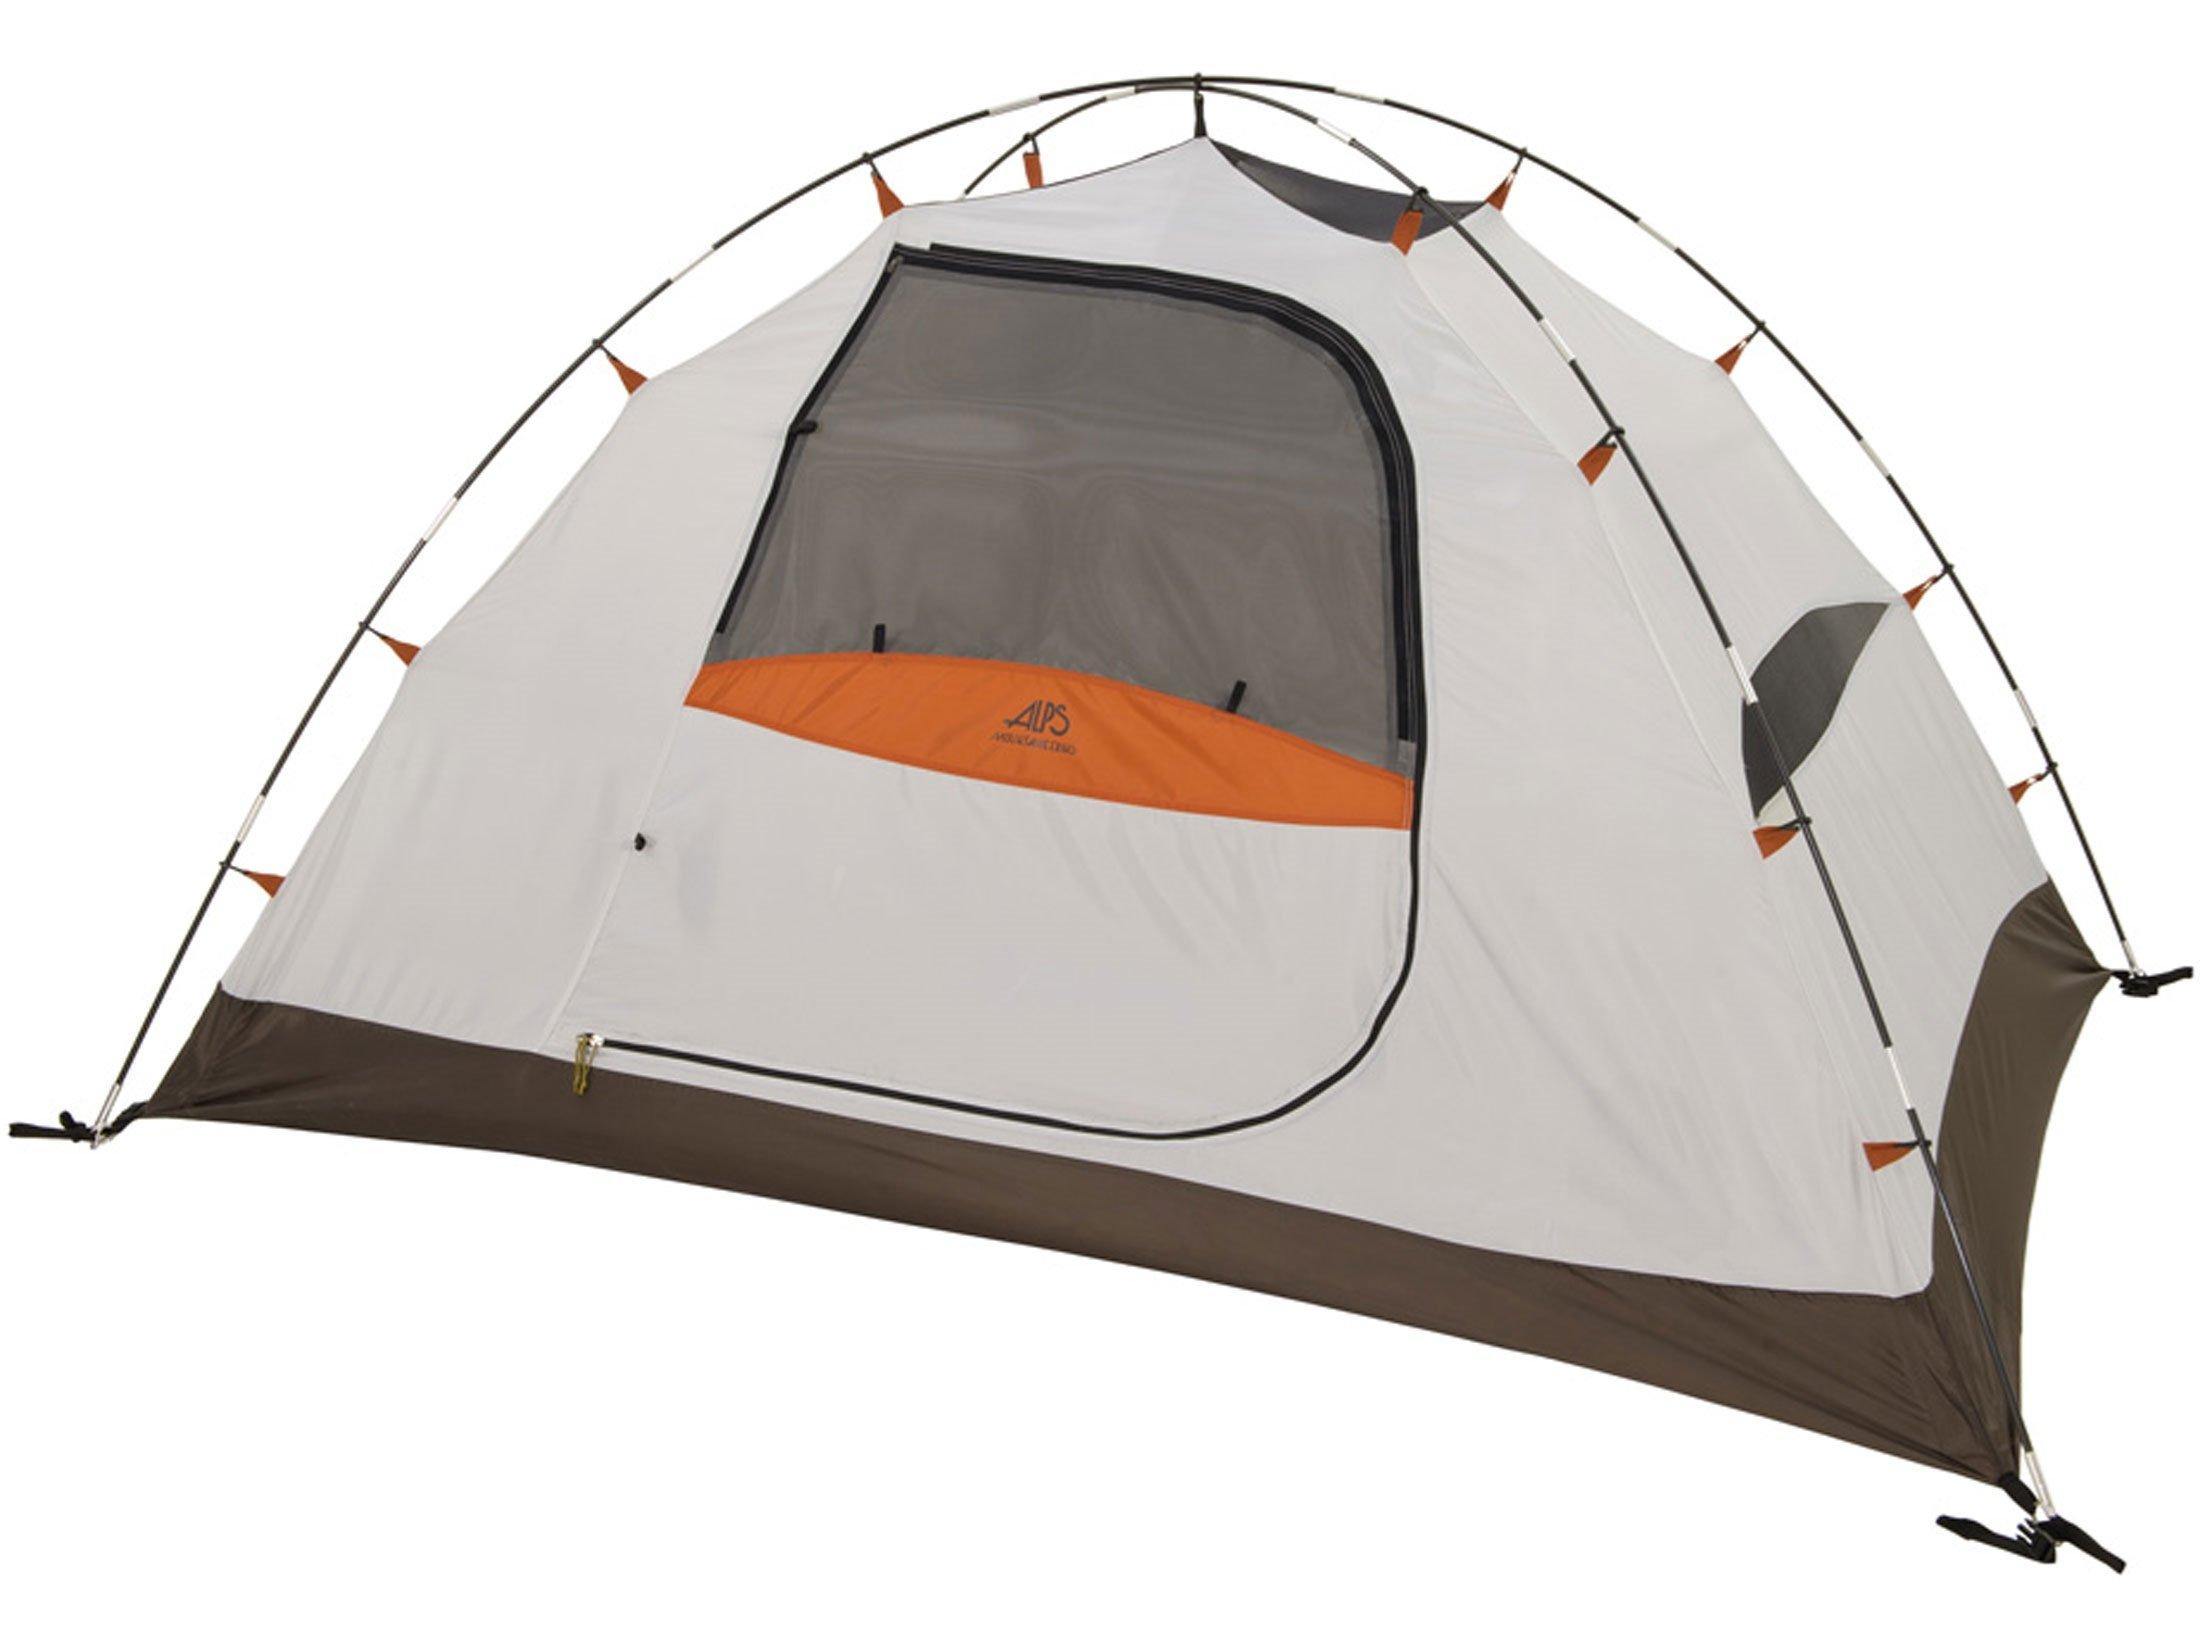 ALPS Mountaineering Taurus 4 Dome Tent